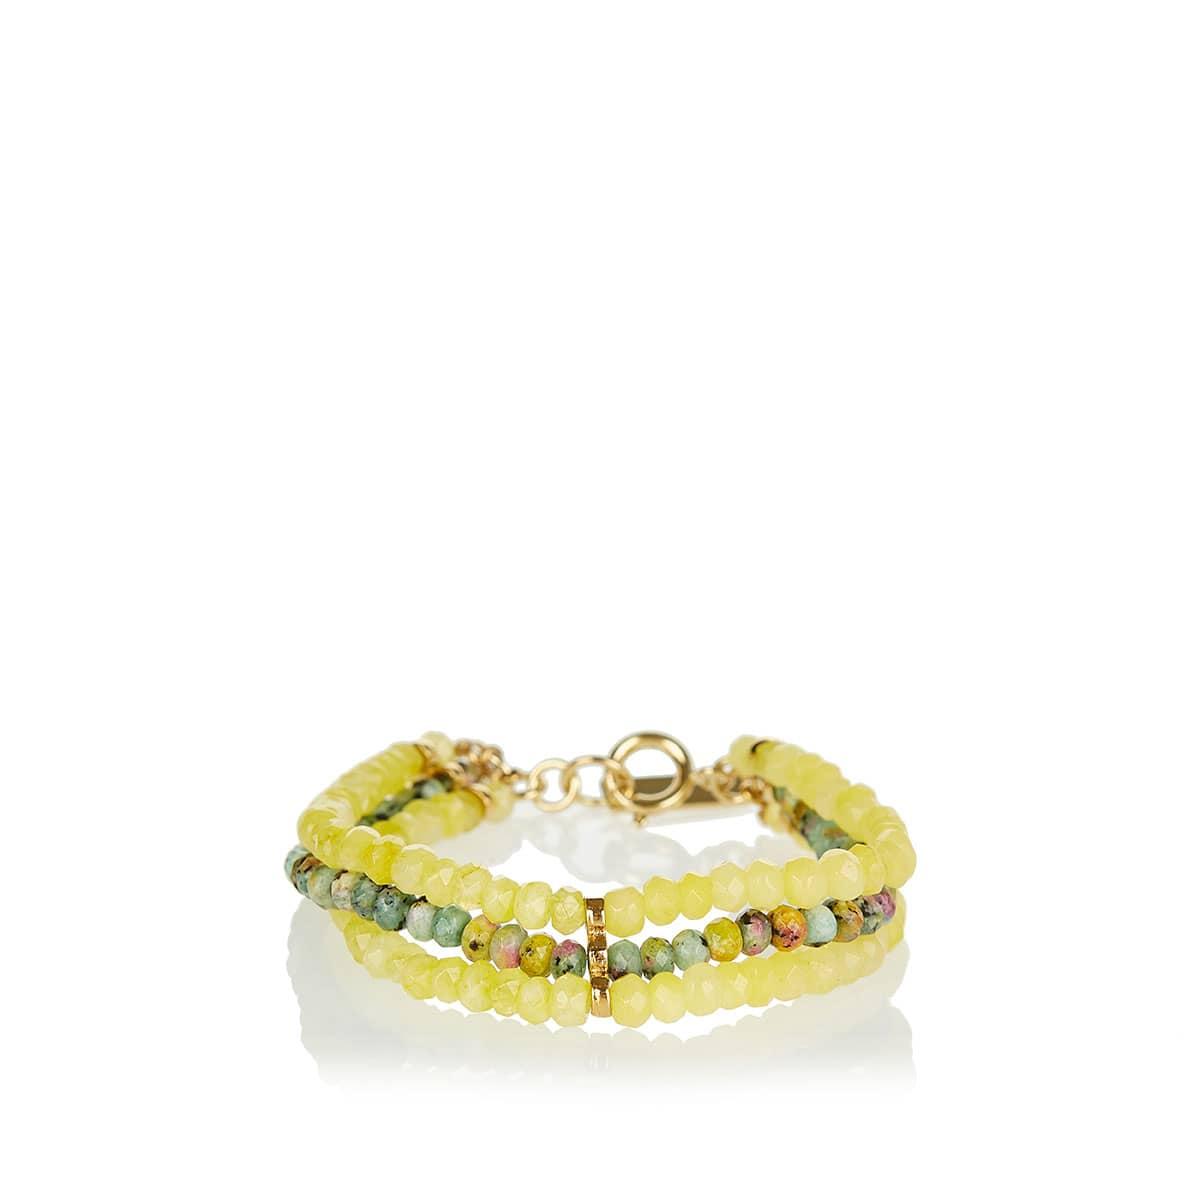 Stone-beaded bracelet